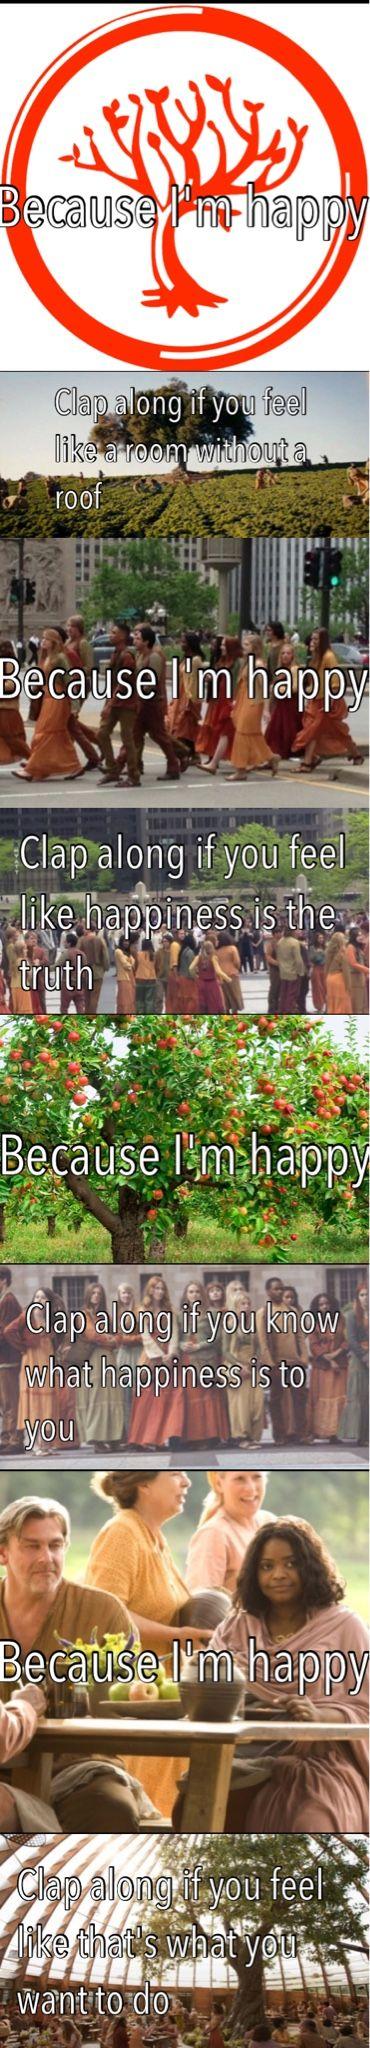 """Happy"" by Pharrell Williams Amity~Divergent & Insurgent"